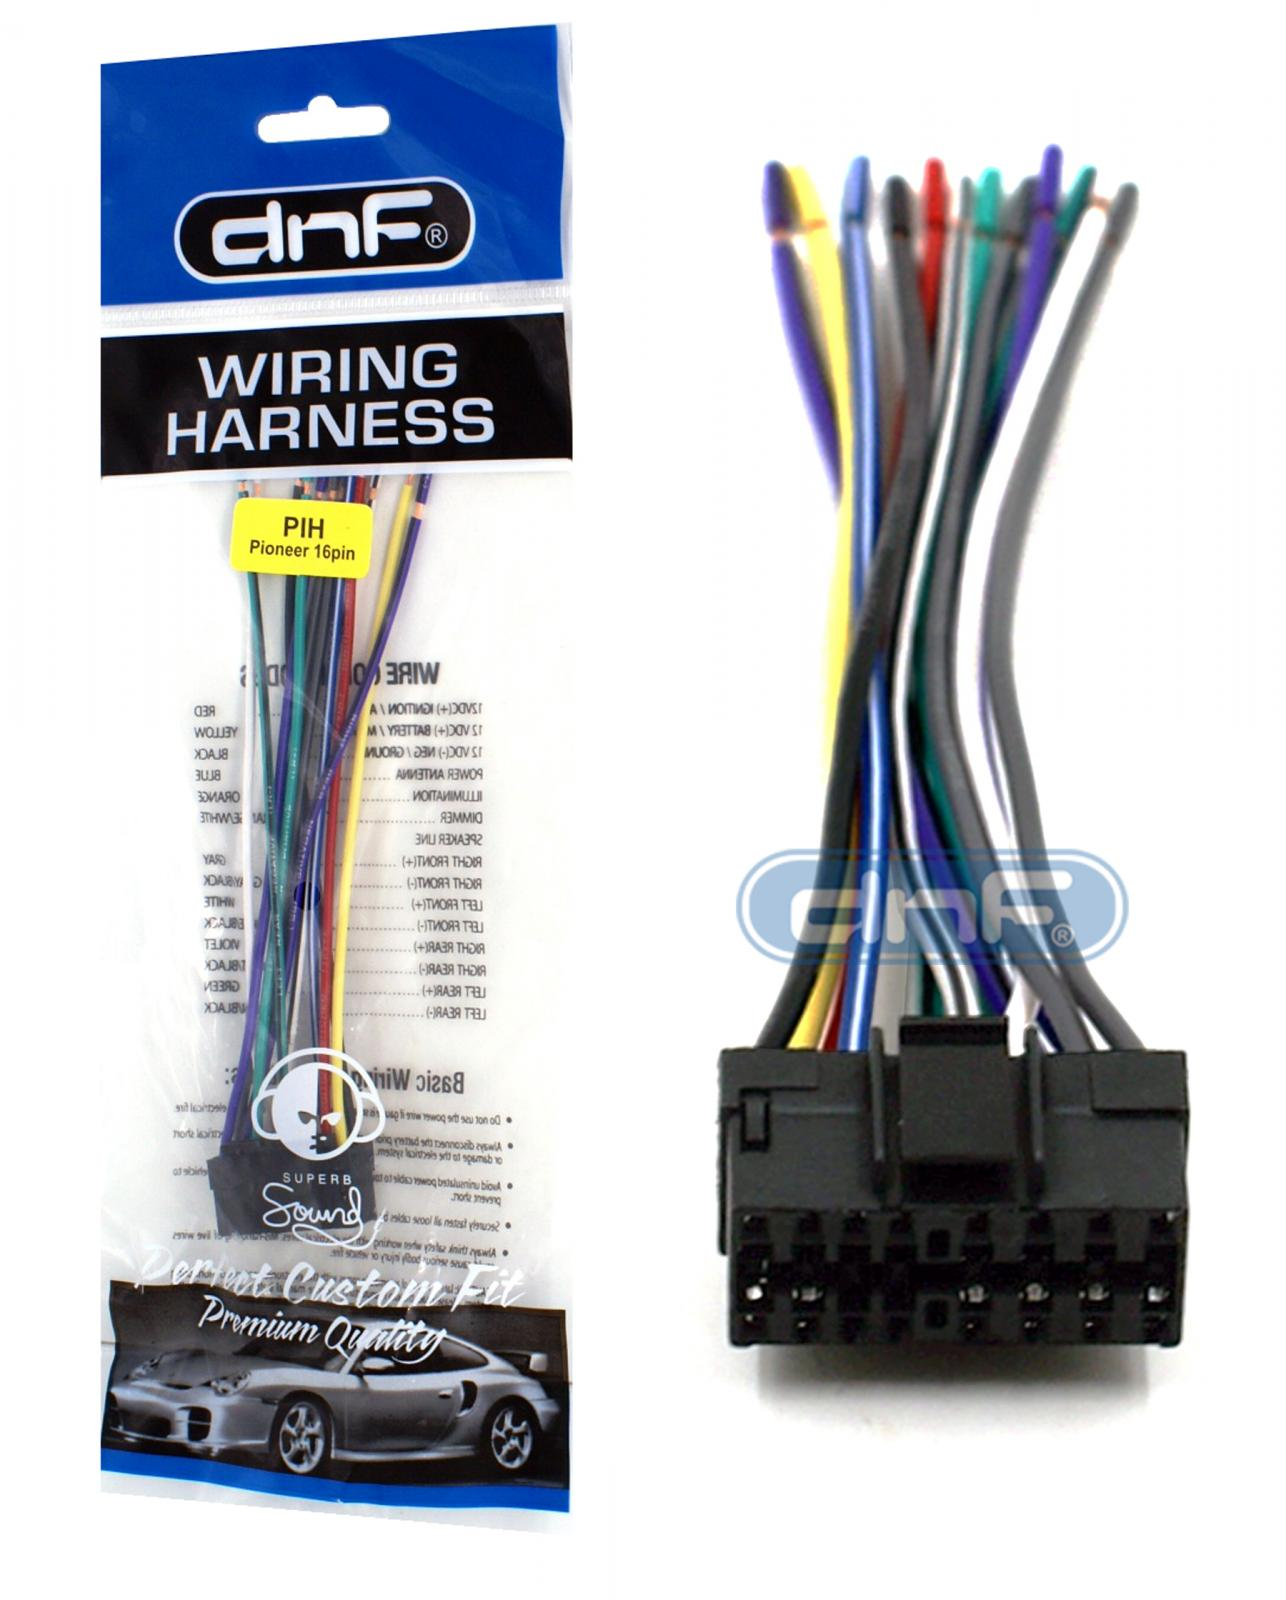 Wiring Harness Pioneer Deh P6000ub Wiring Harness Pioneer Deh 2100